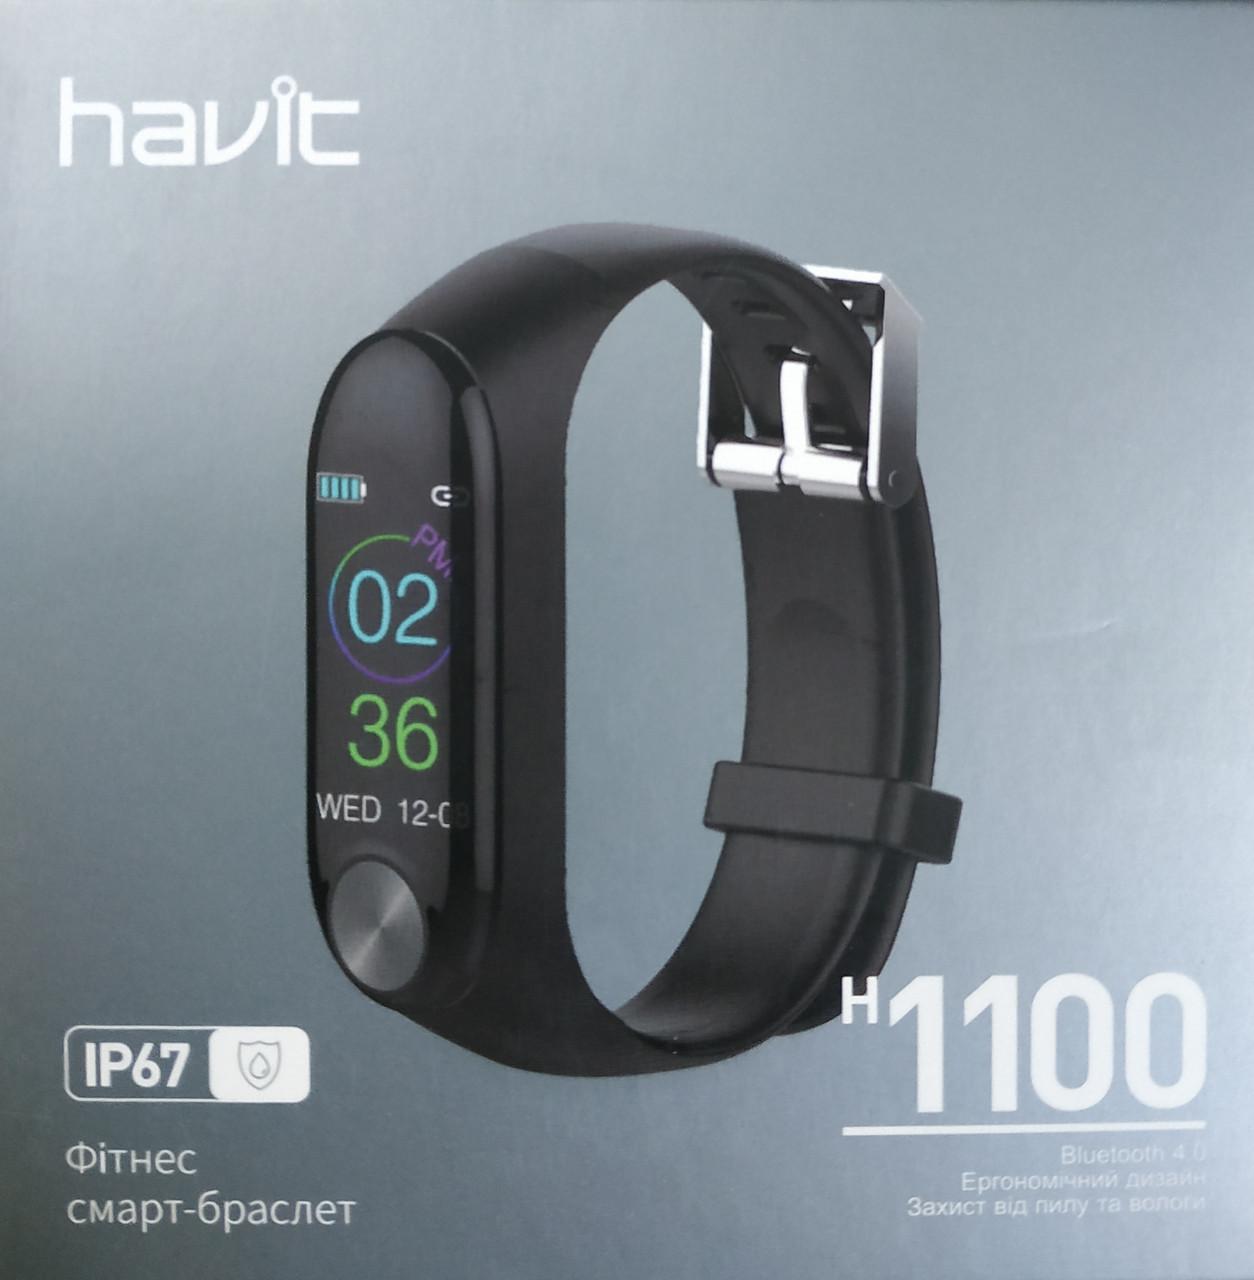 Фитнес смарт-браслет Havit HV-H1100 черный